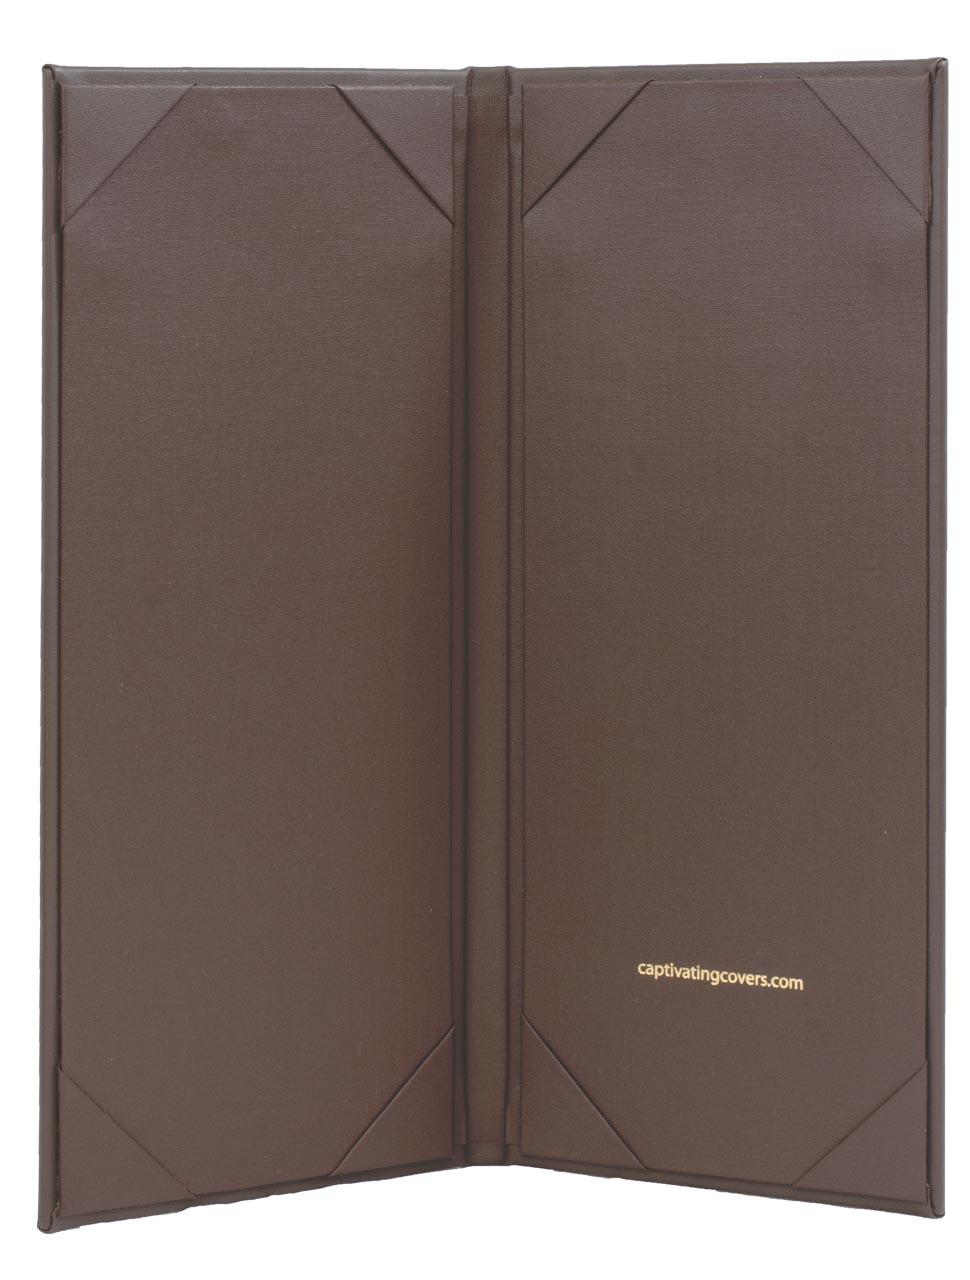 "4.25"" x 11"" Insert, 2-Panel Menu Cover Dark Brown (inside)"